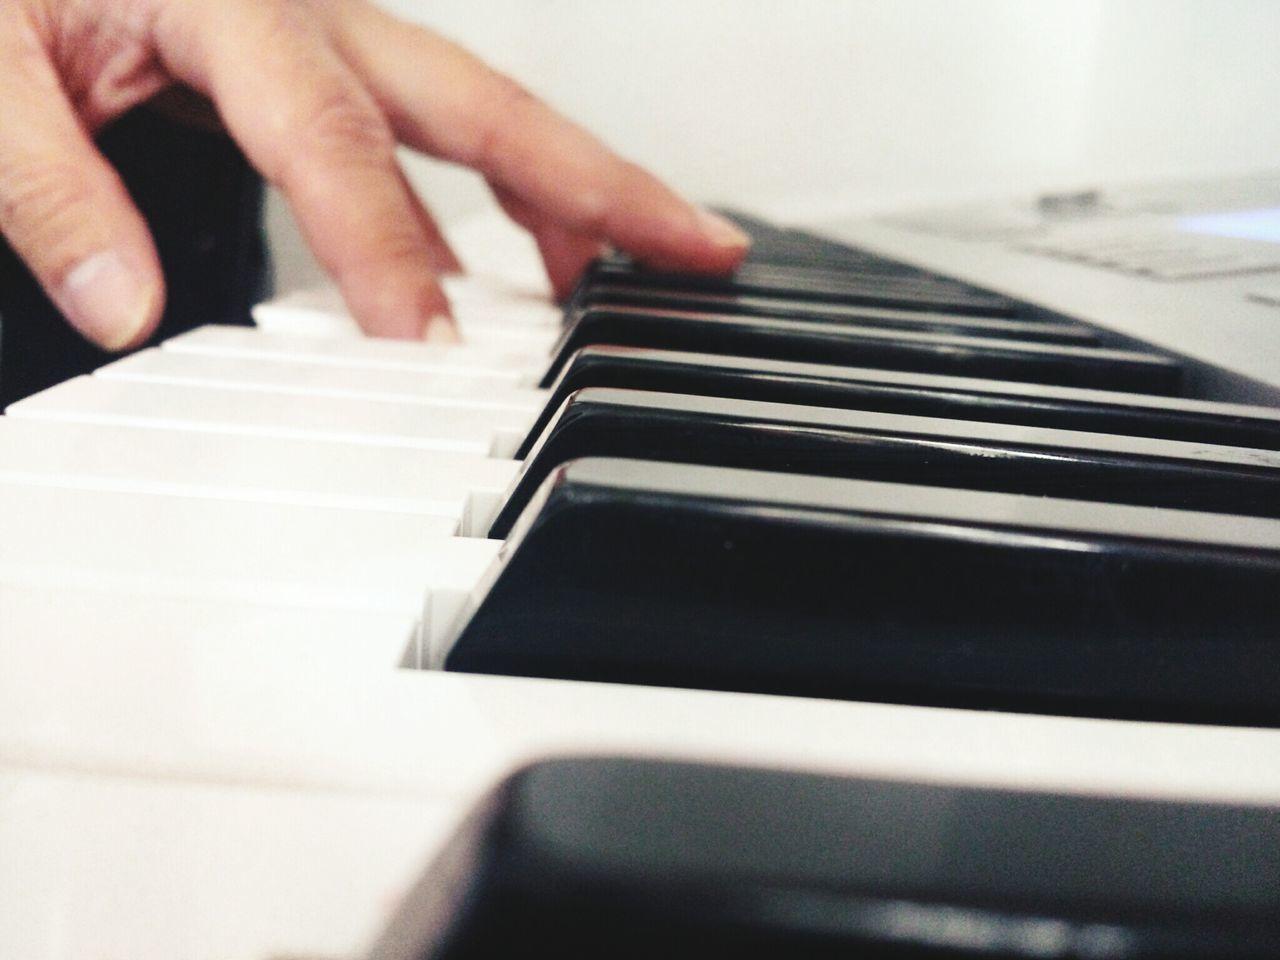 Playing Piano Piano Keys Pianist Pianokeys Pianoporn Piano Lover Playing The Piano Piano Man Piano Keyboard  The Amazing Human Body